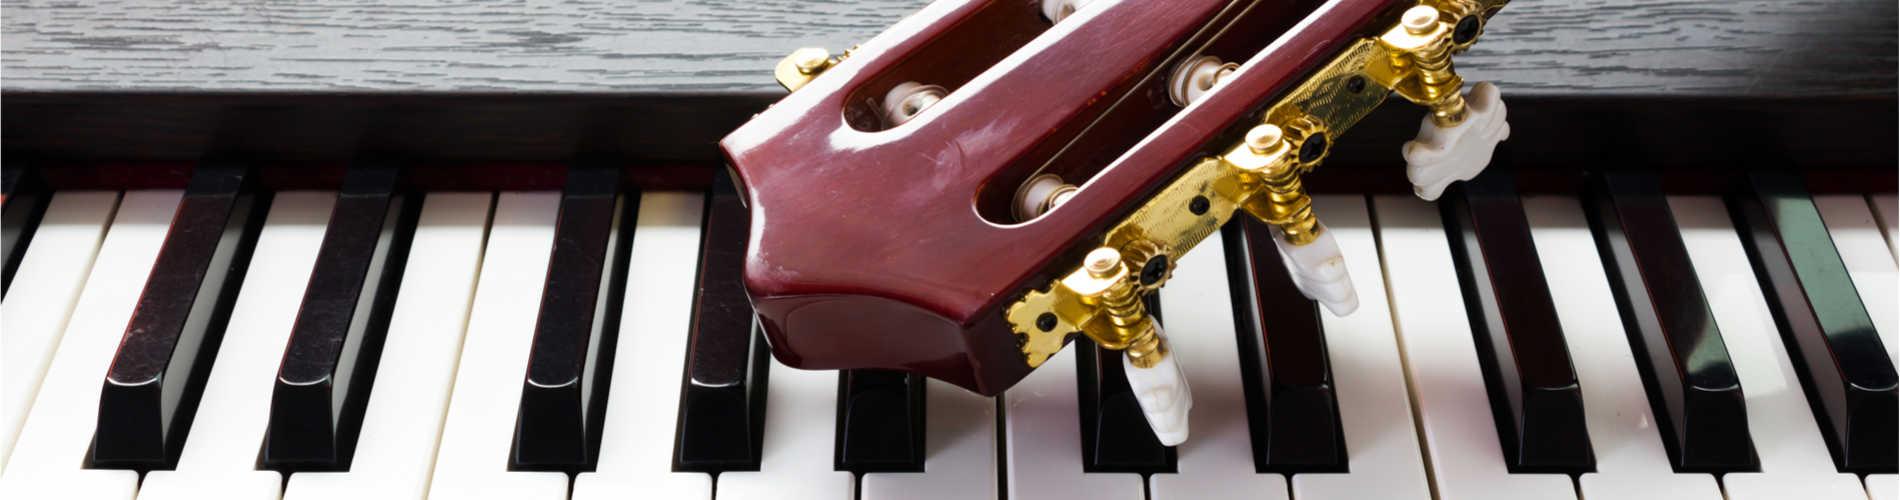 Accord musique